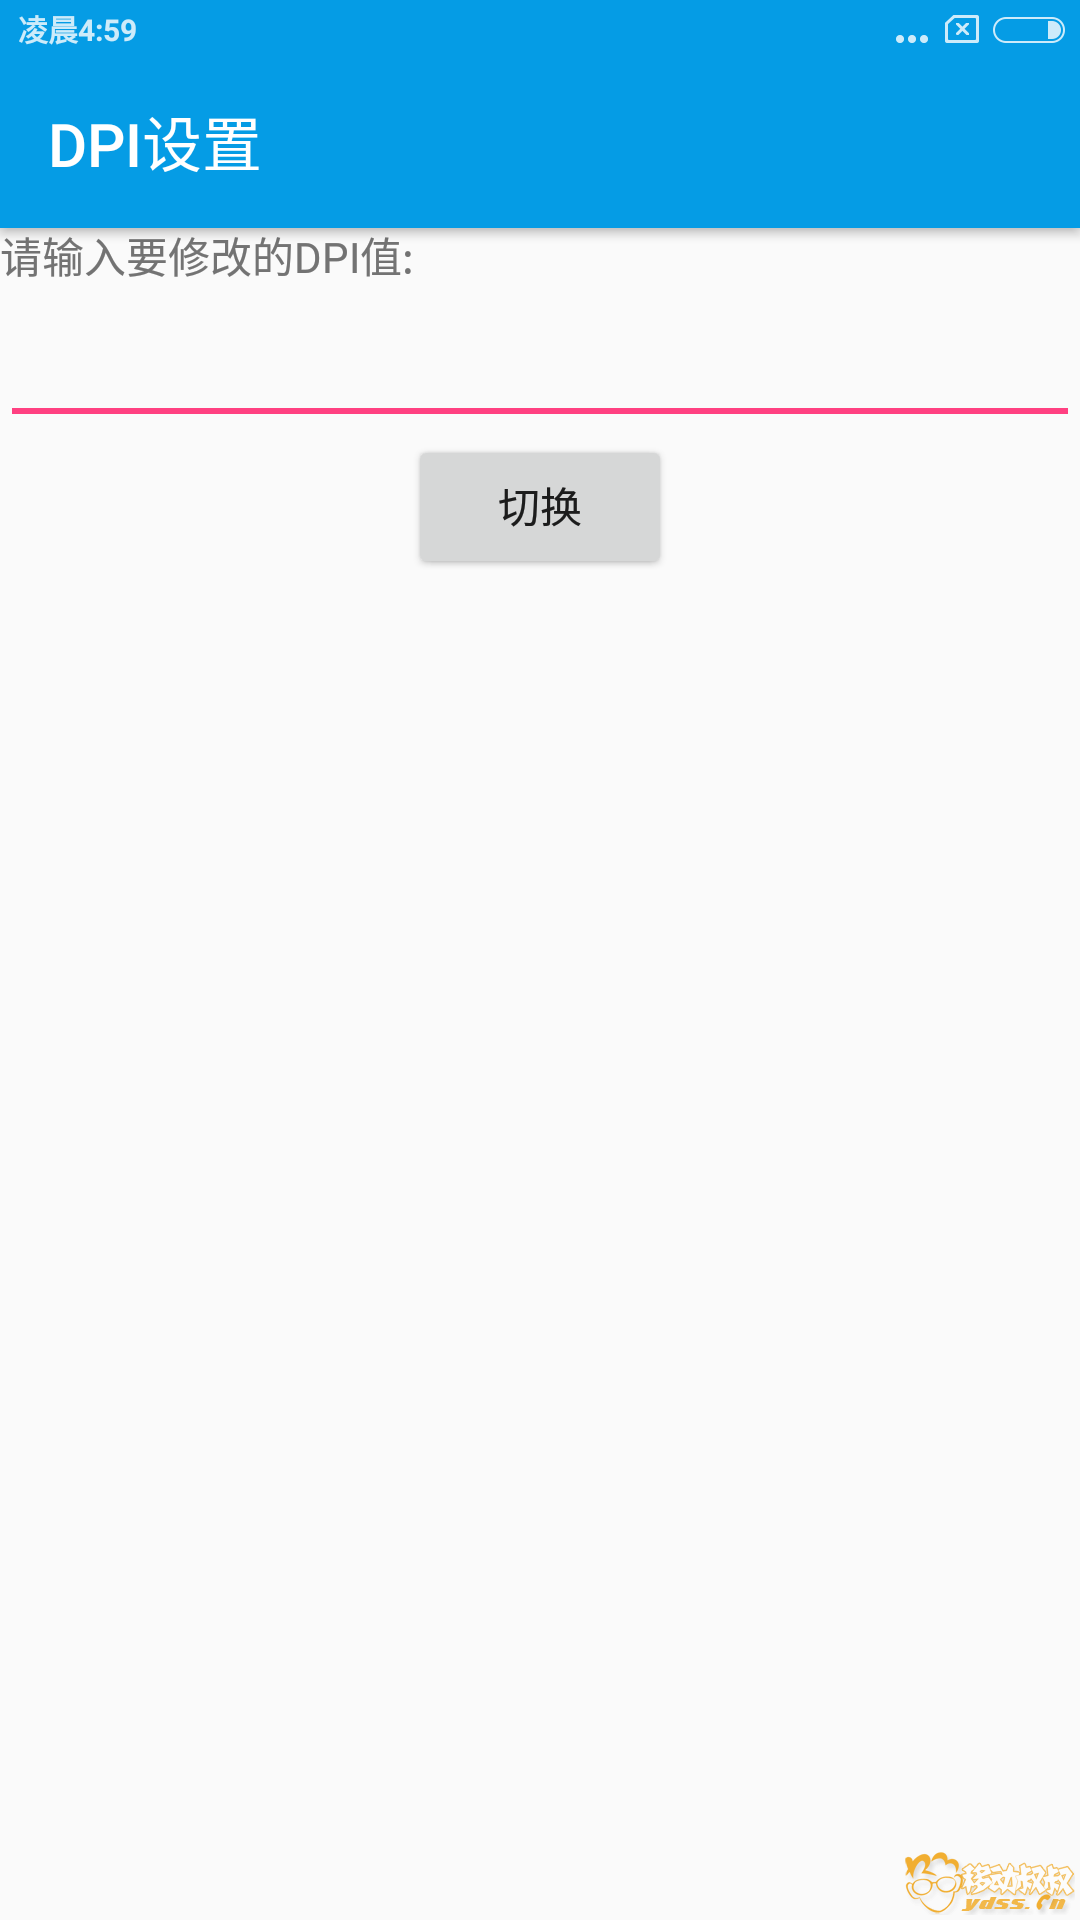 Screenshot_2018-03-12-04-59-50-019_com.example.dh.myapplication.png